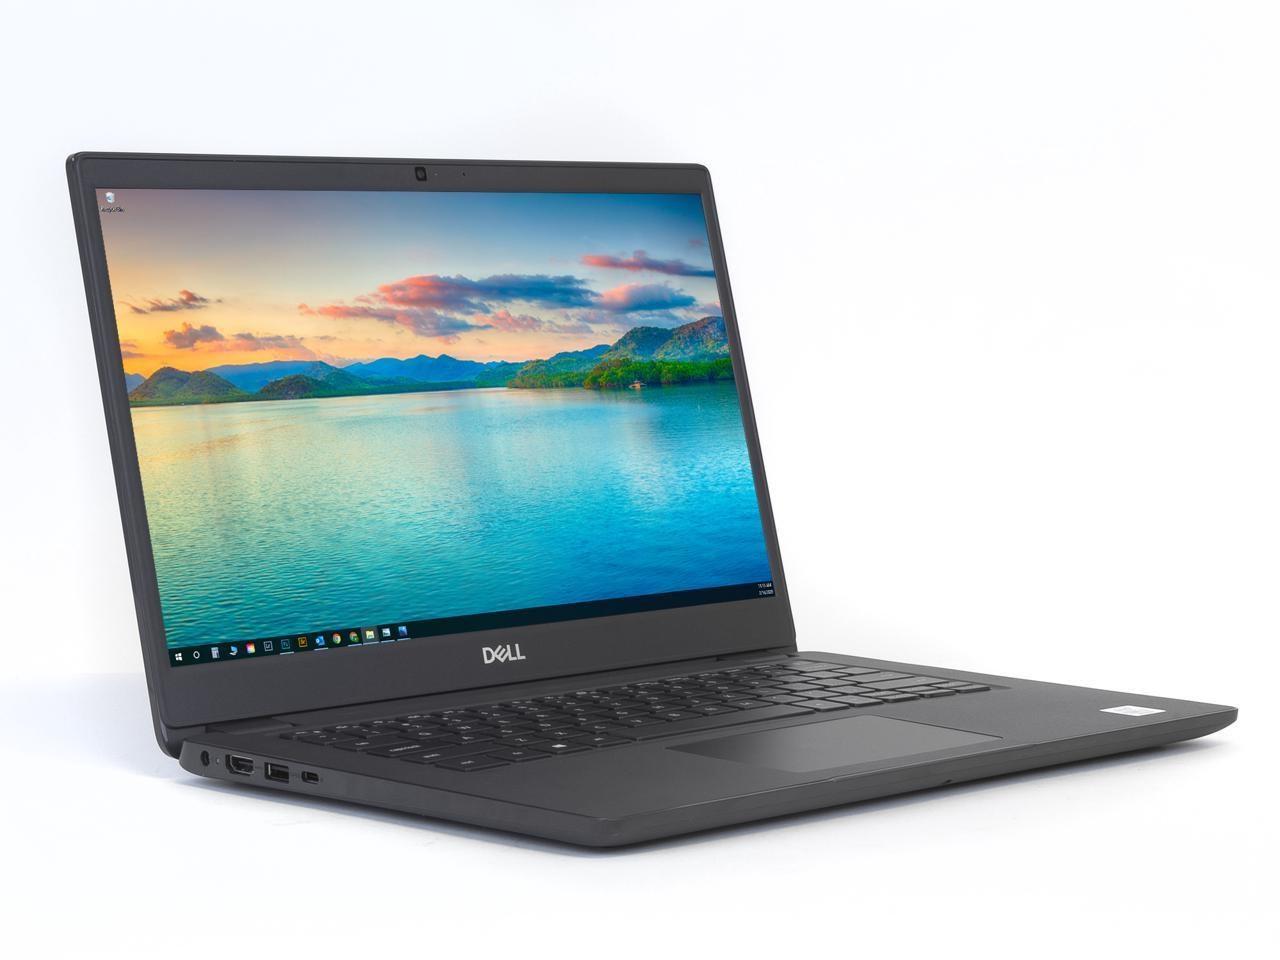 Dell-Latitude-3410-i7-10510-14''-8G-256SSD-WPro